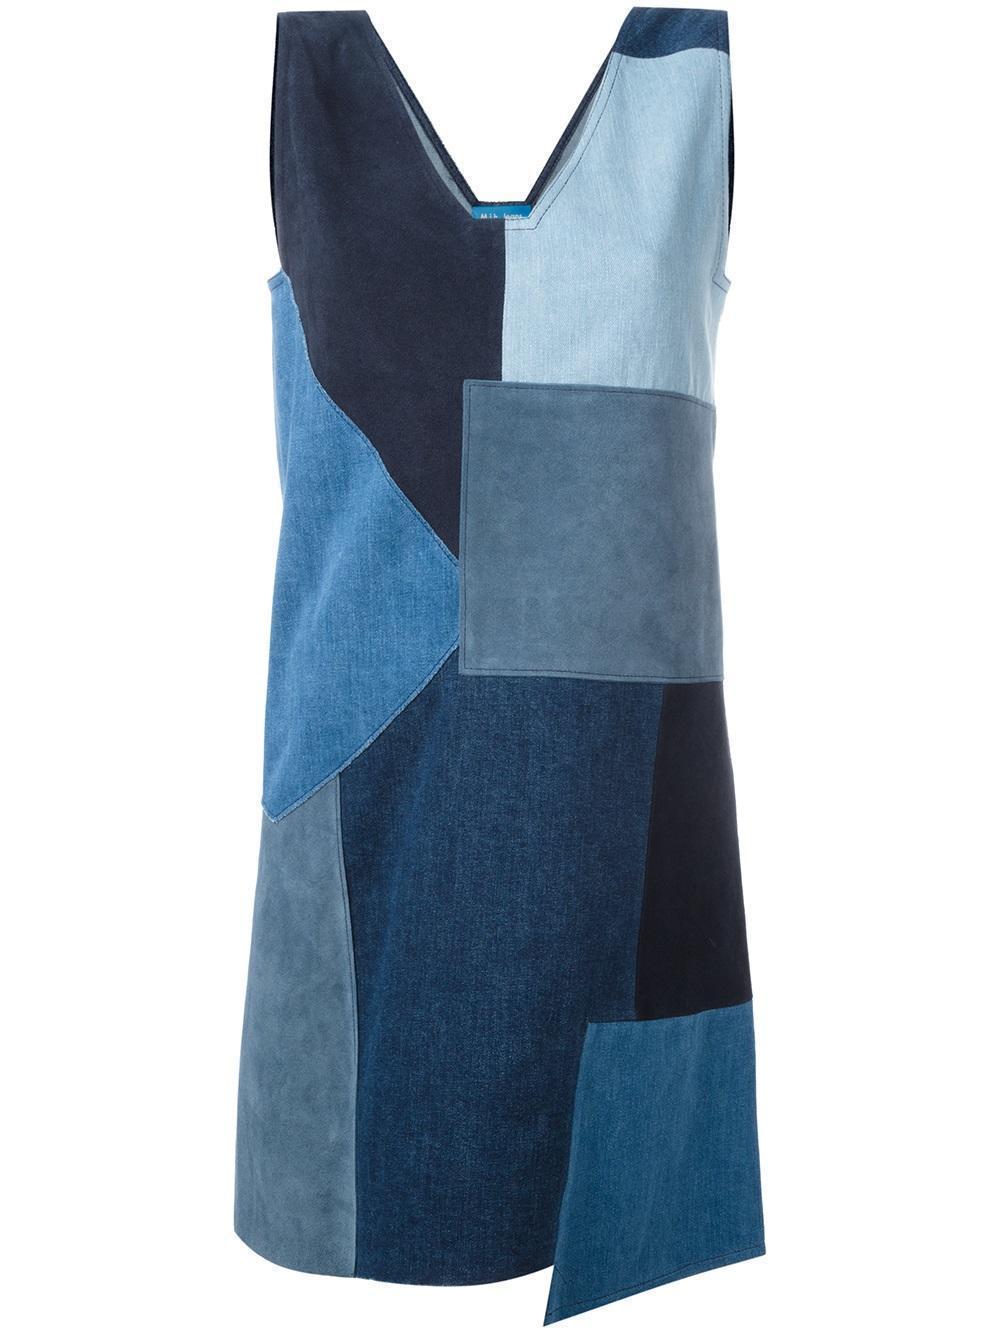 Anthropologie M.i.h Patchwork Marten Dress $545 Sz M - NWT